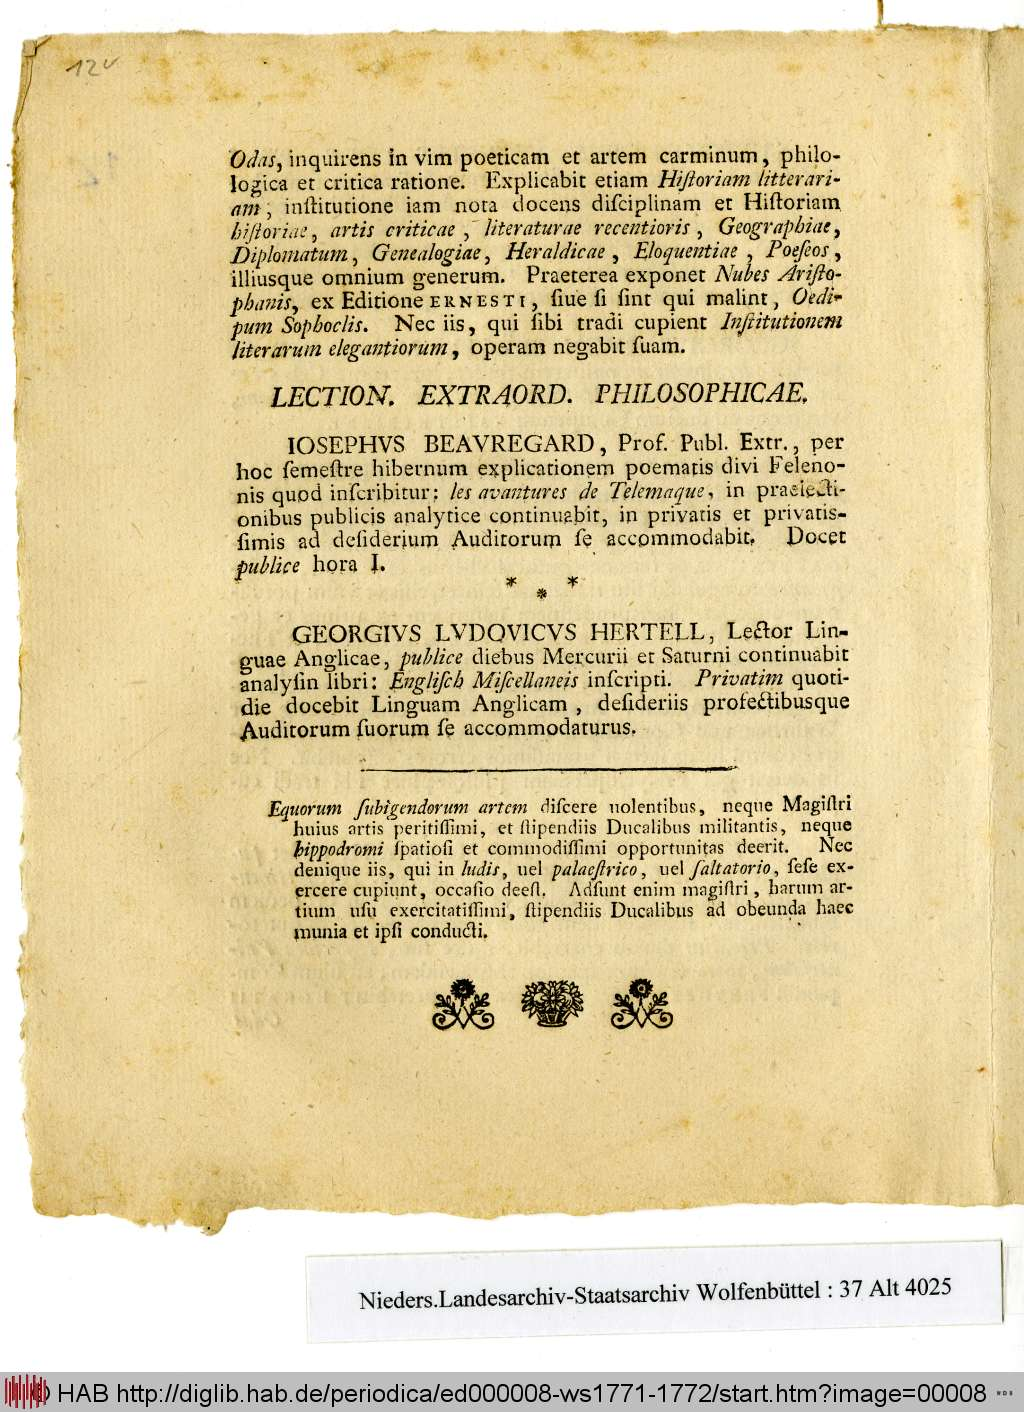 https://diglib.hab.de/periodica/ed000008-ws1771-1772/00008.jpg